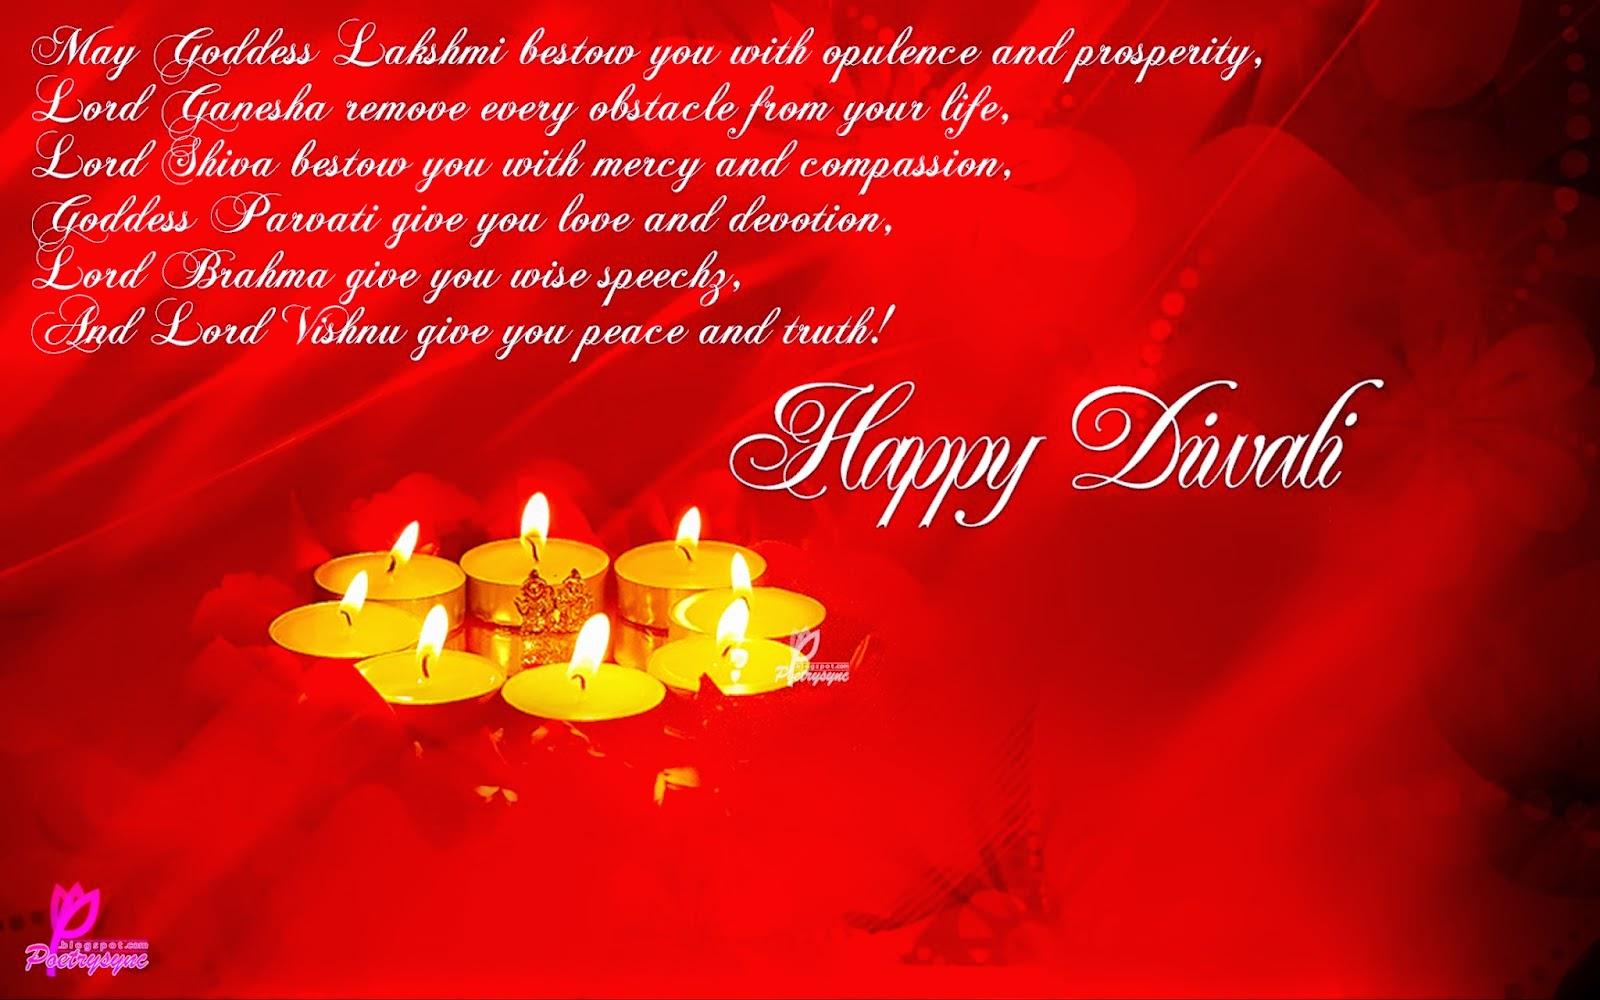 happy diwali messages 2014